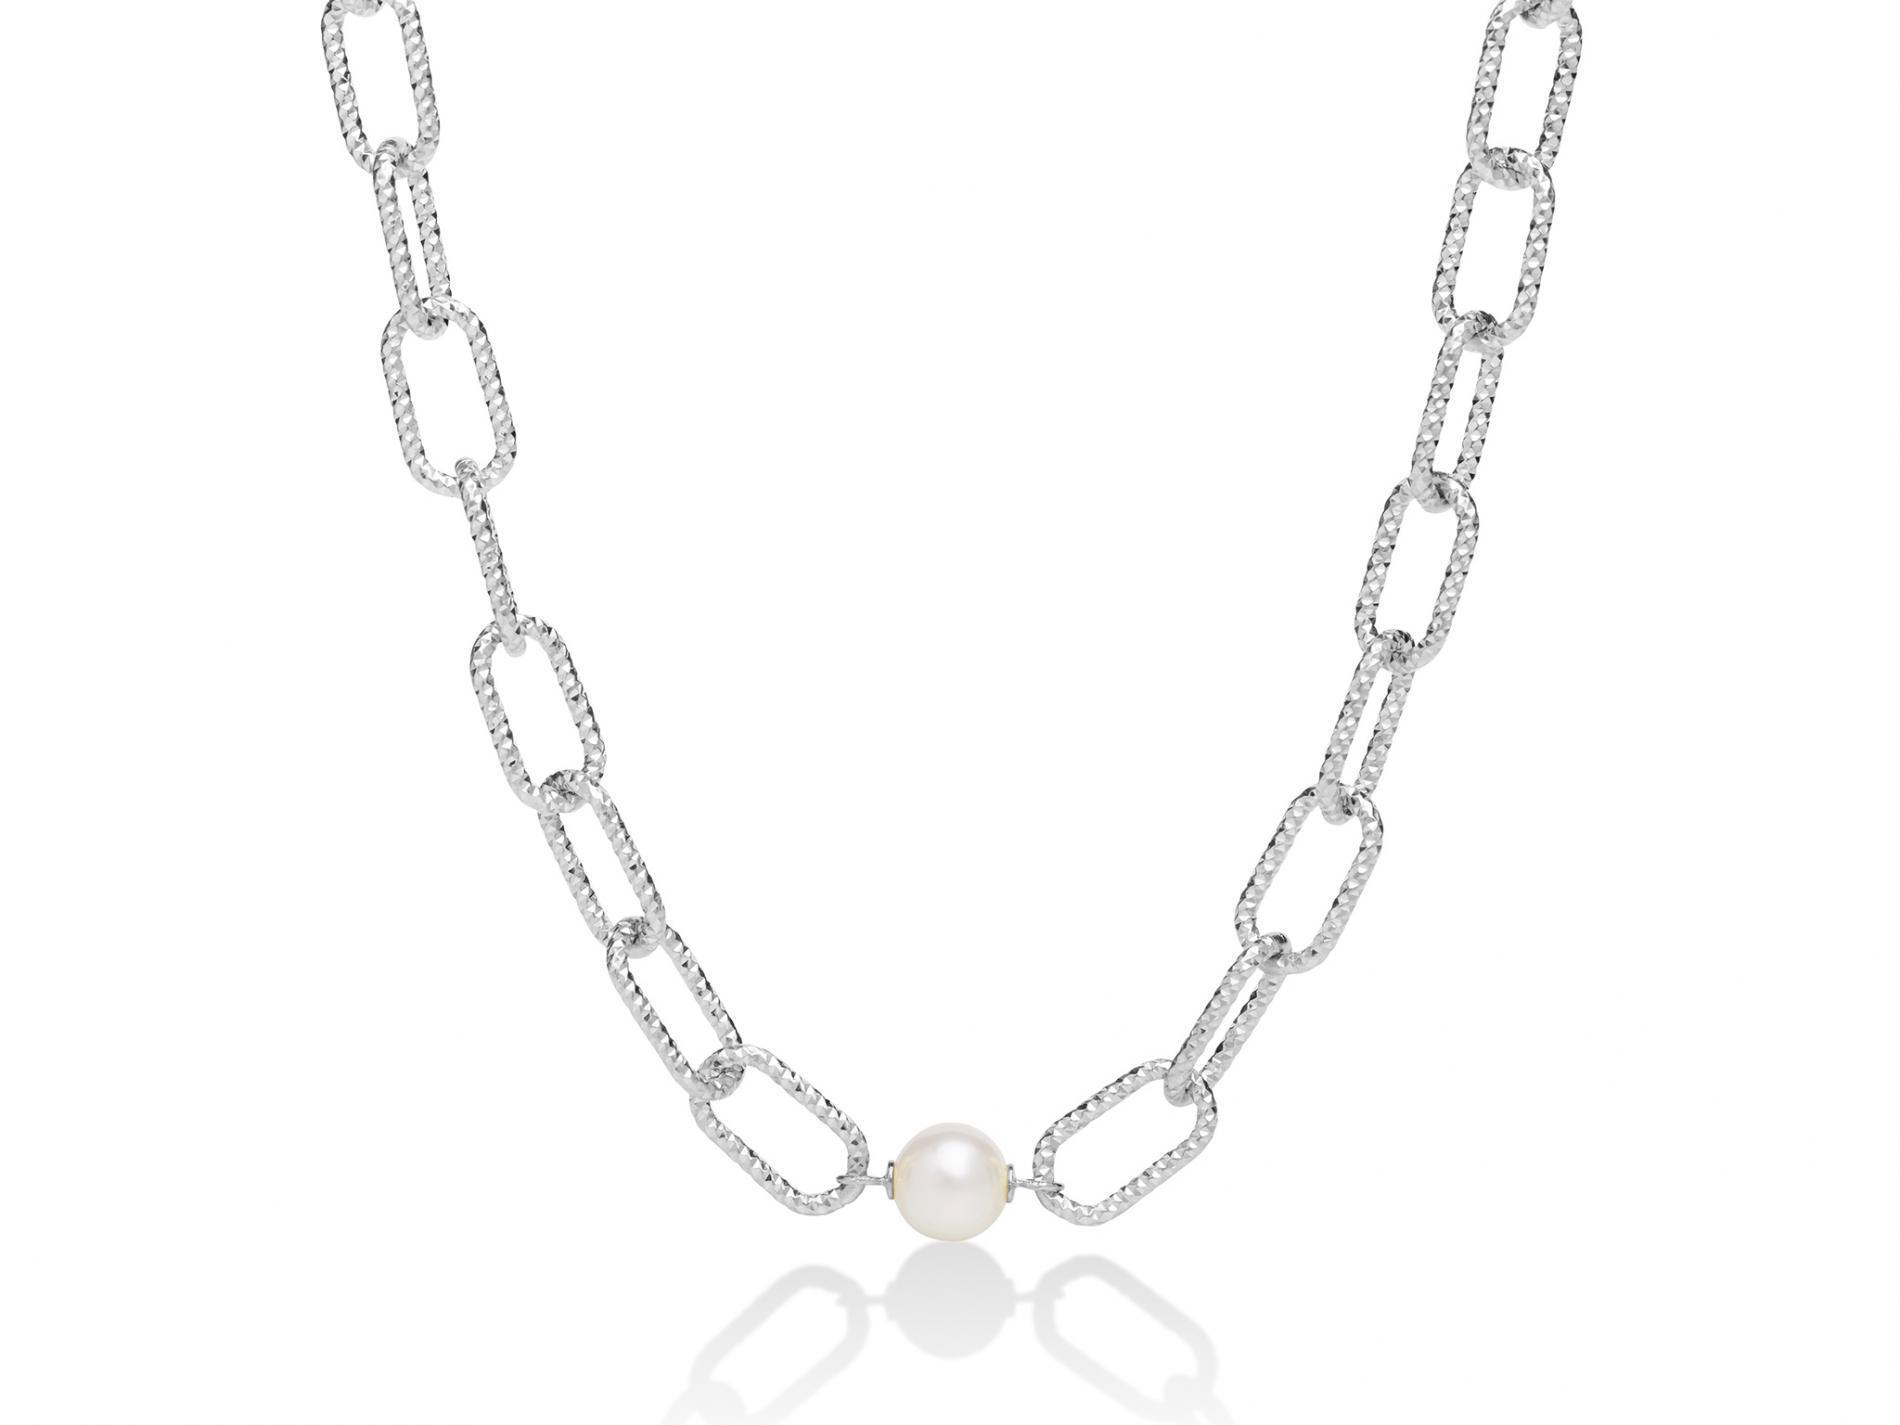 Collana argento Miluna PCL6070 B